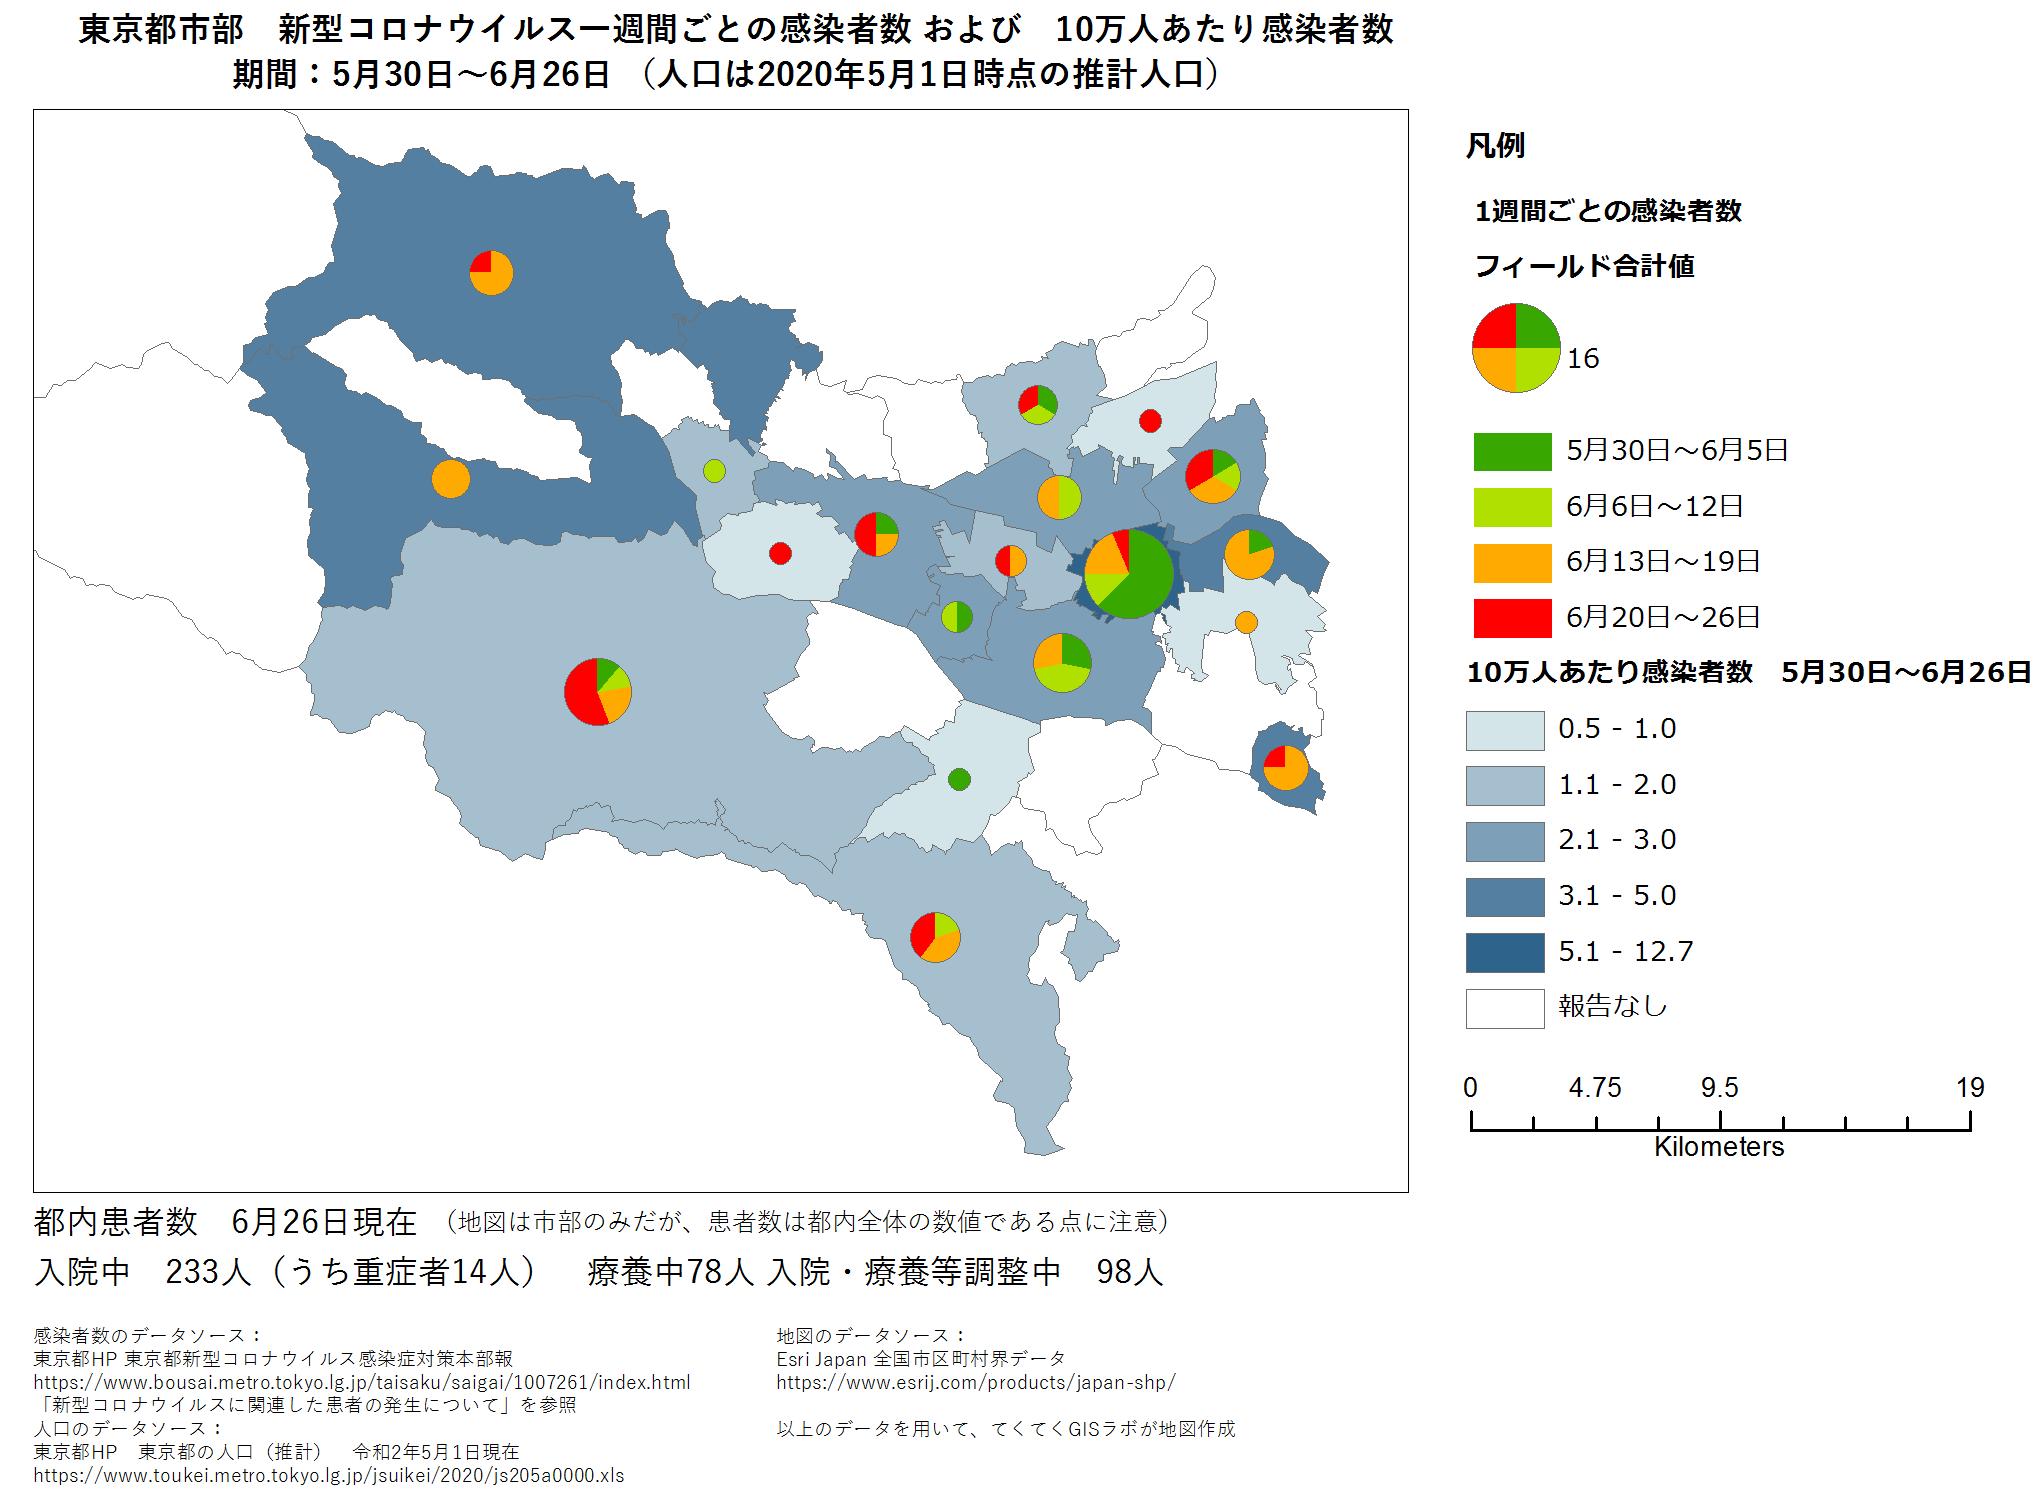 1週間ごと感染者数、東京市部、5月30日〜6月26日